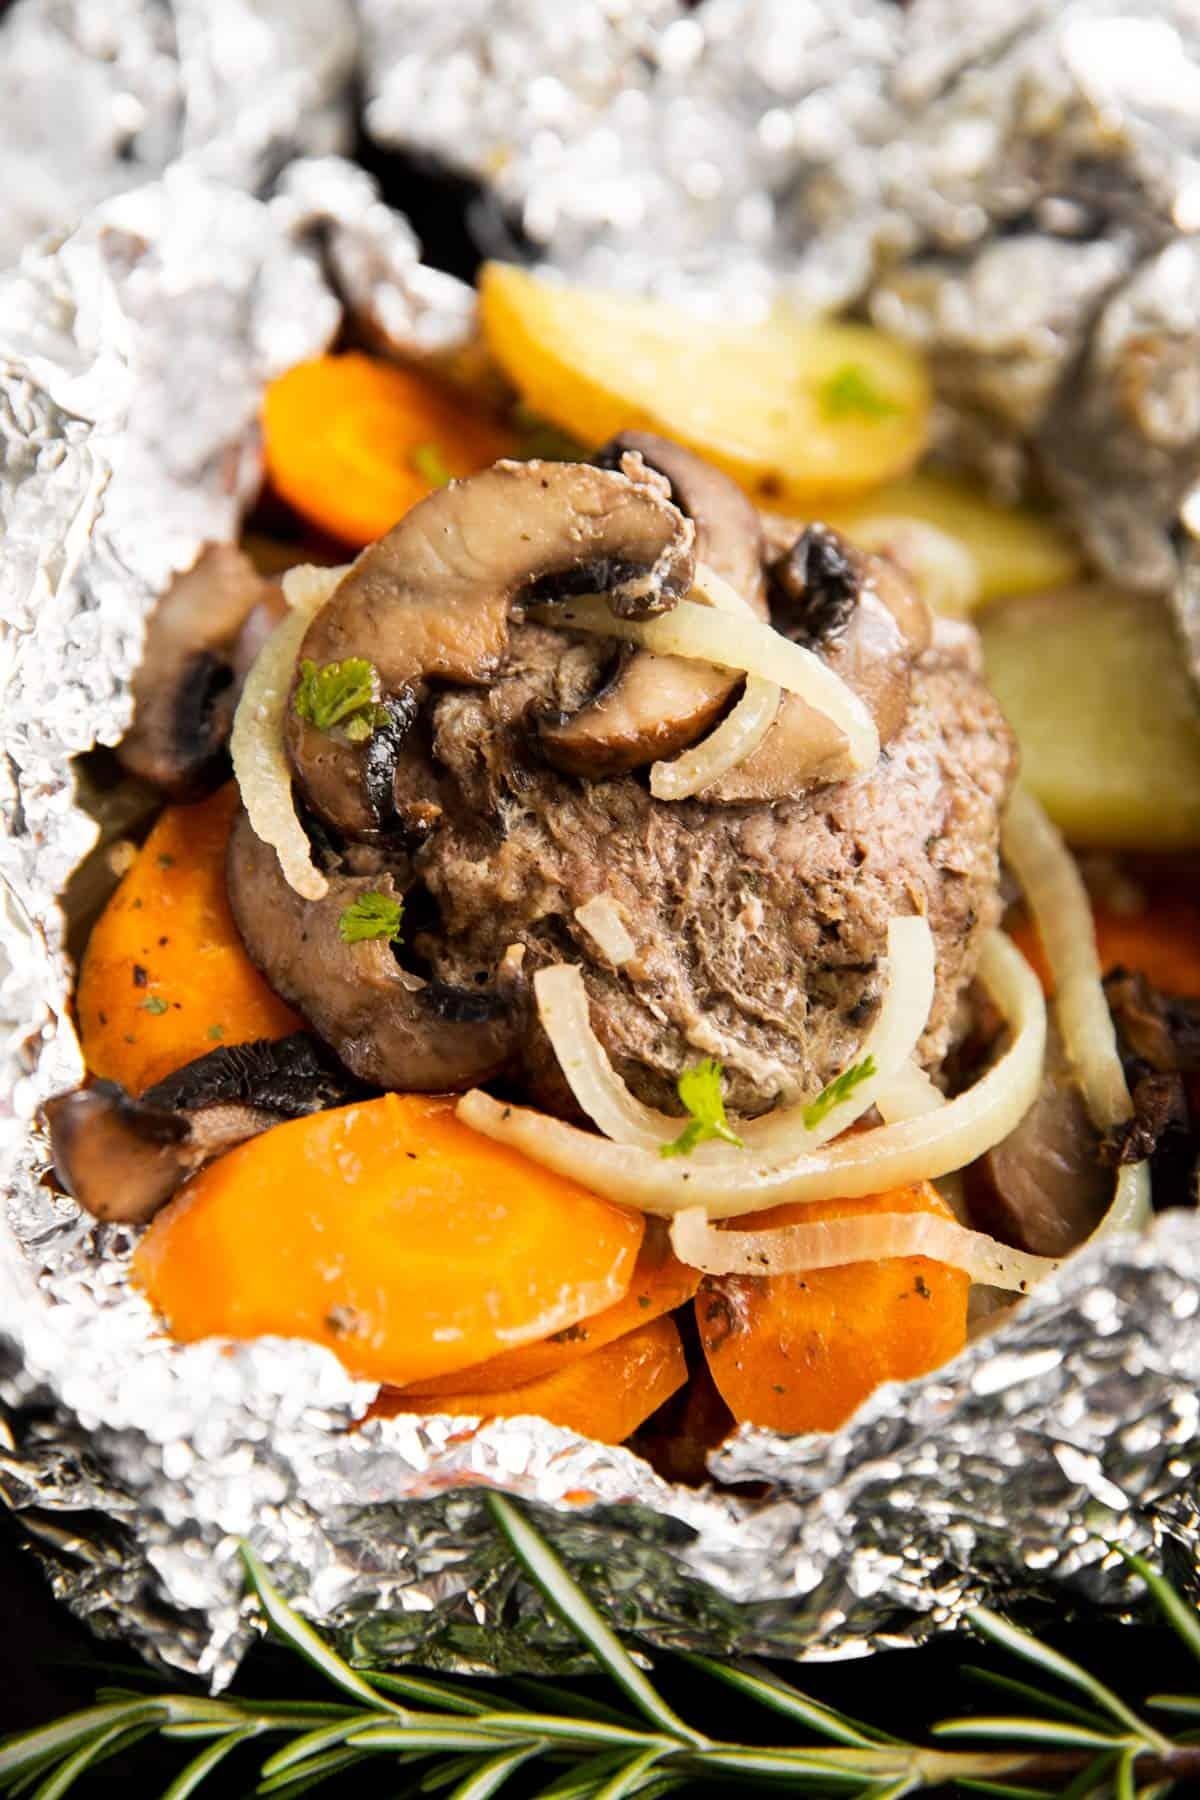 hamburger patty on carrots with mushroom and onions